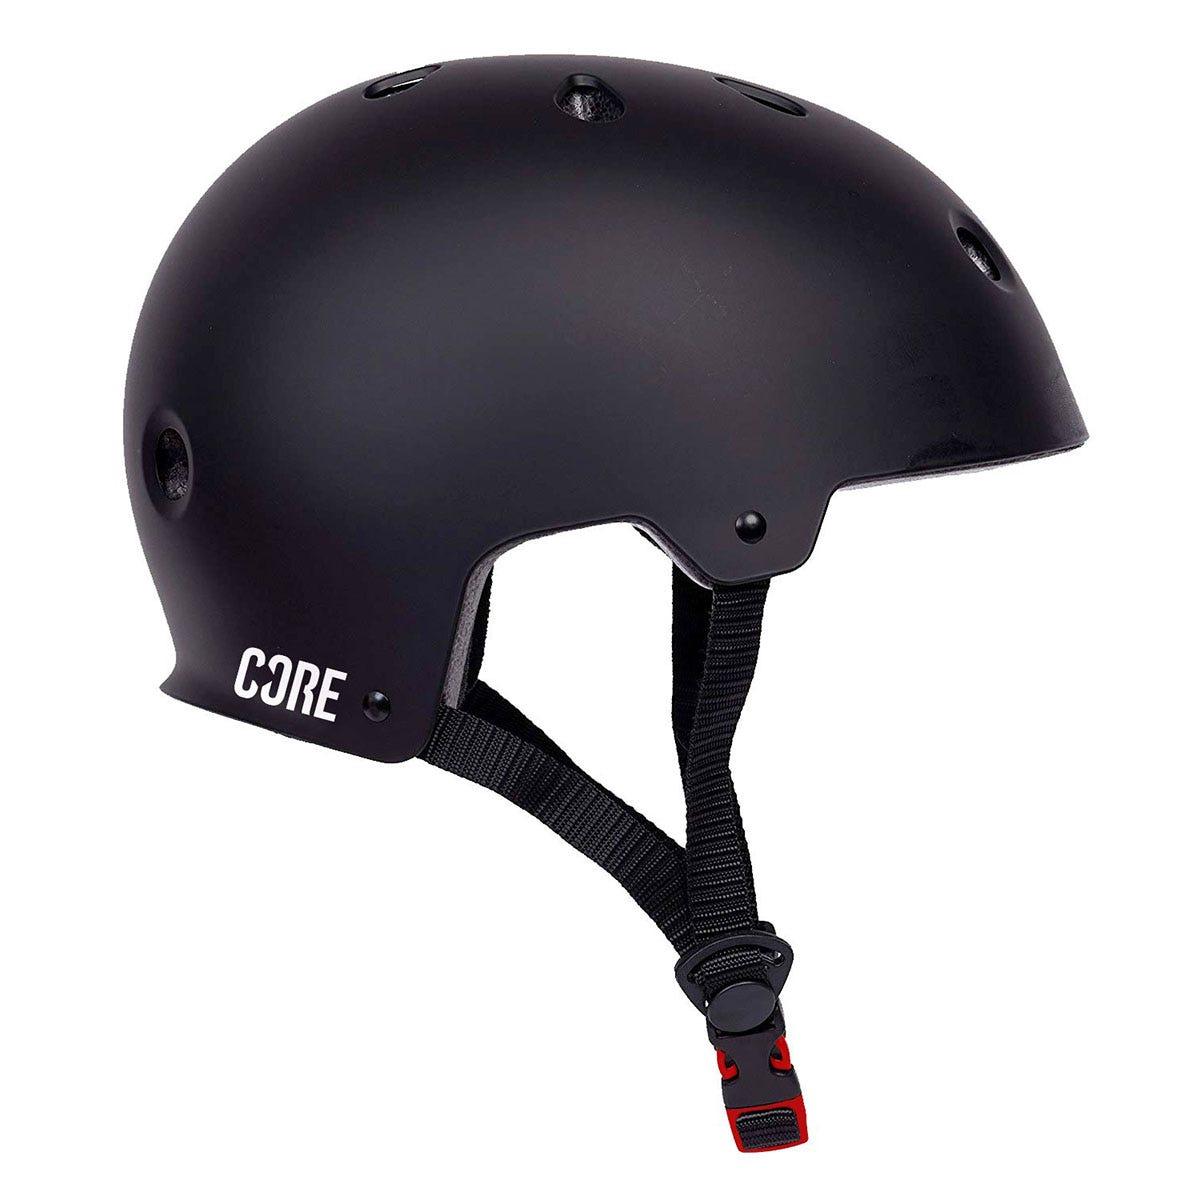 CORE Basic Helmet - Black L/XL